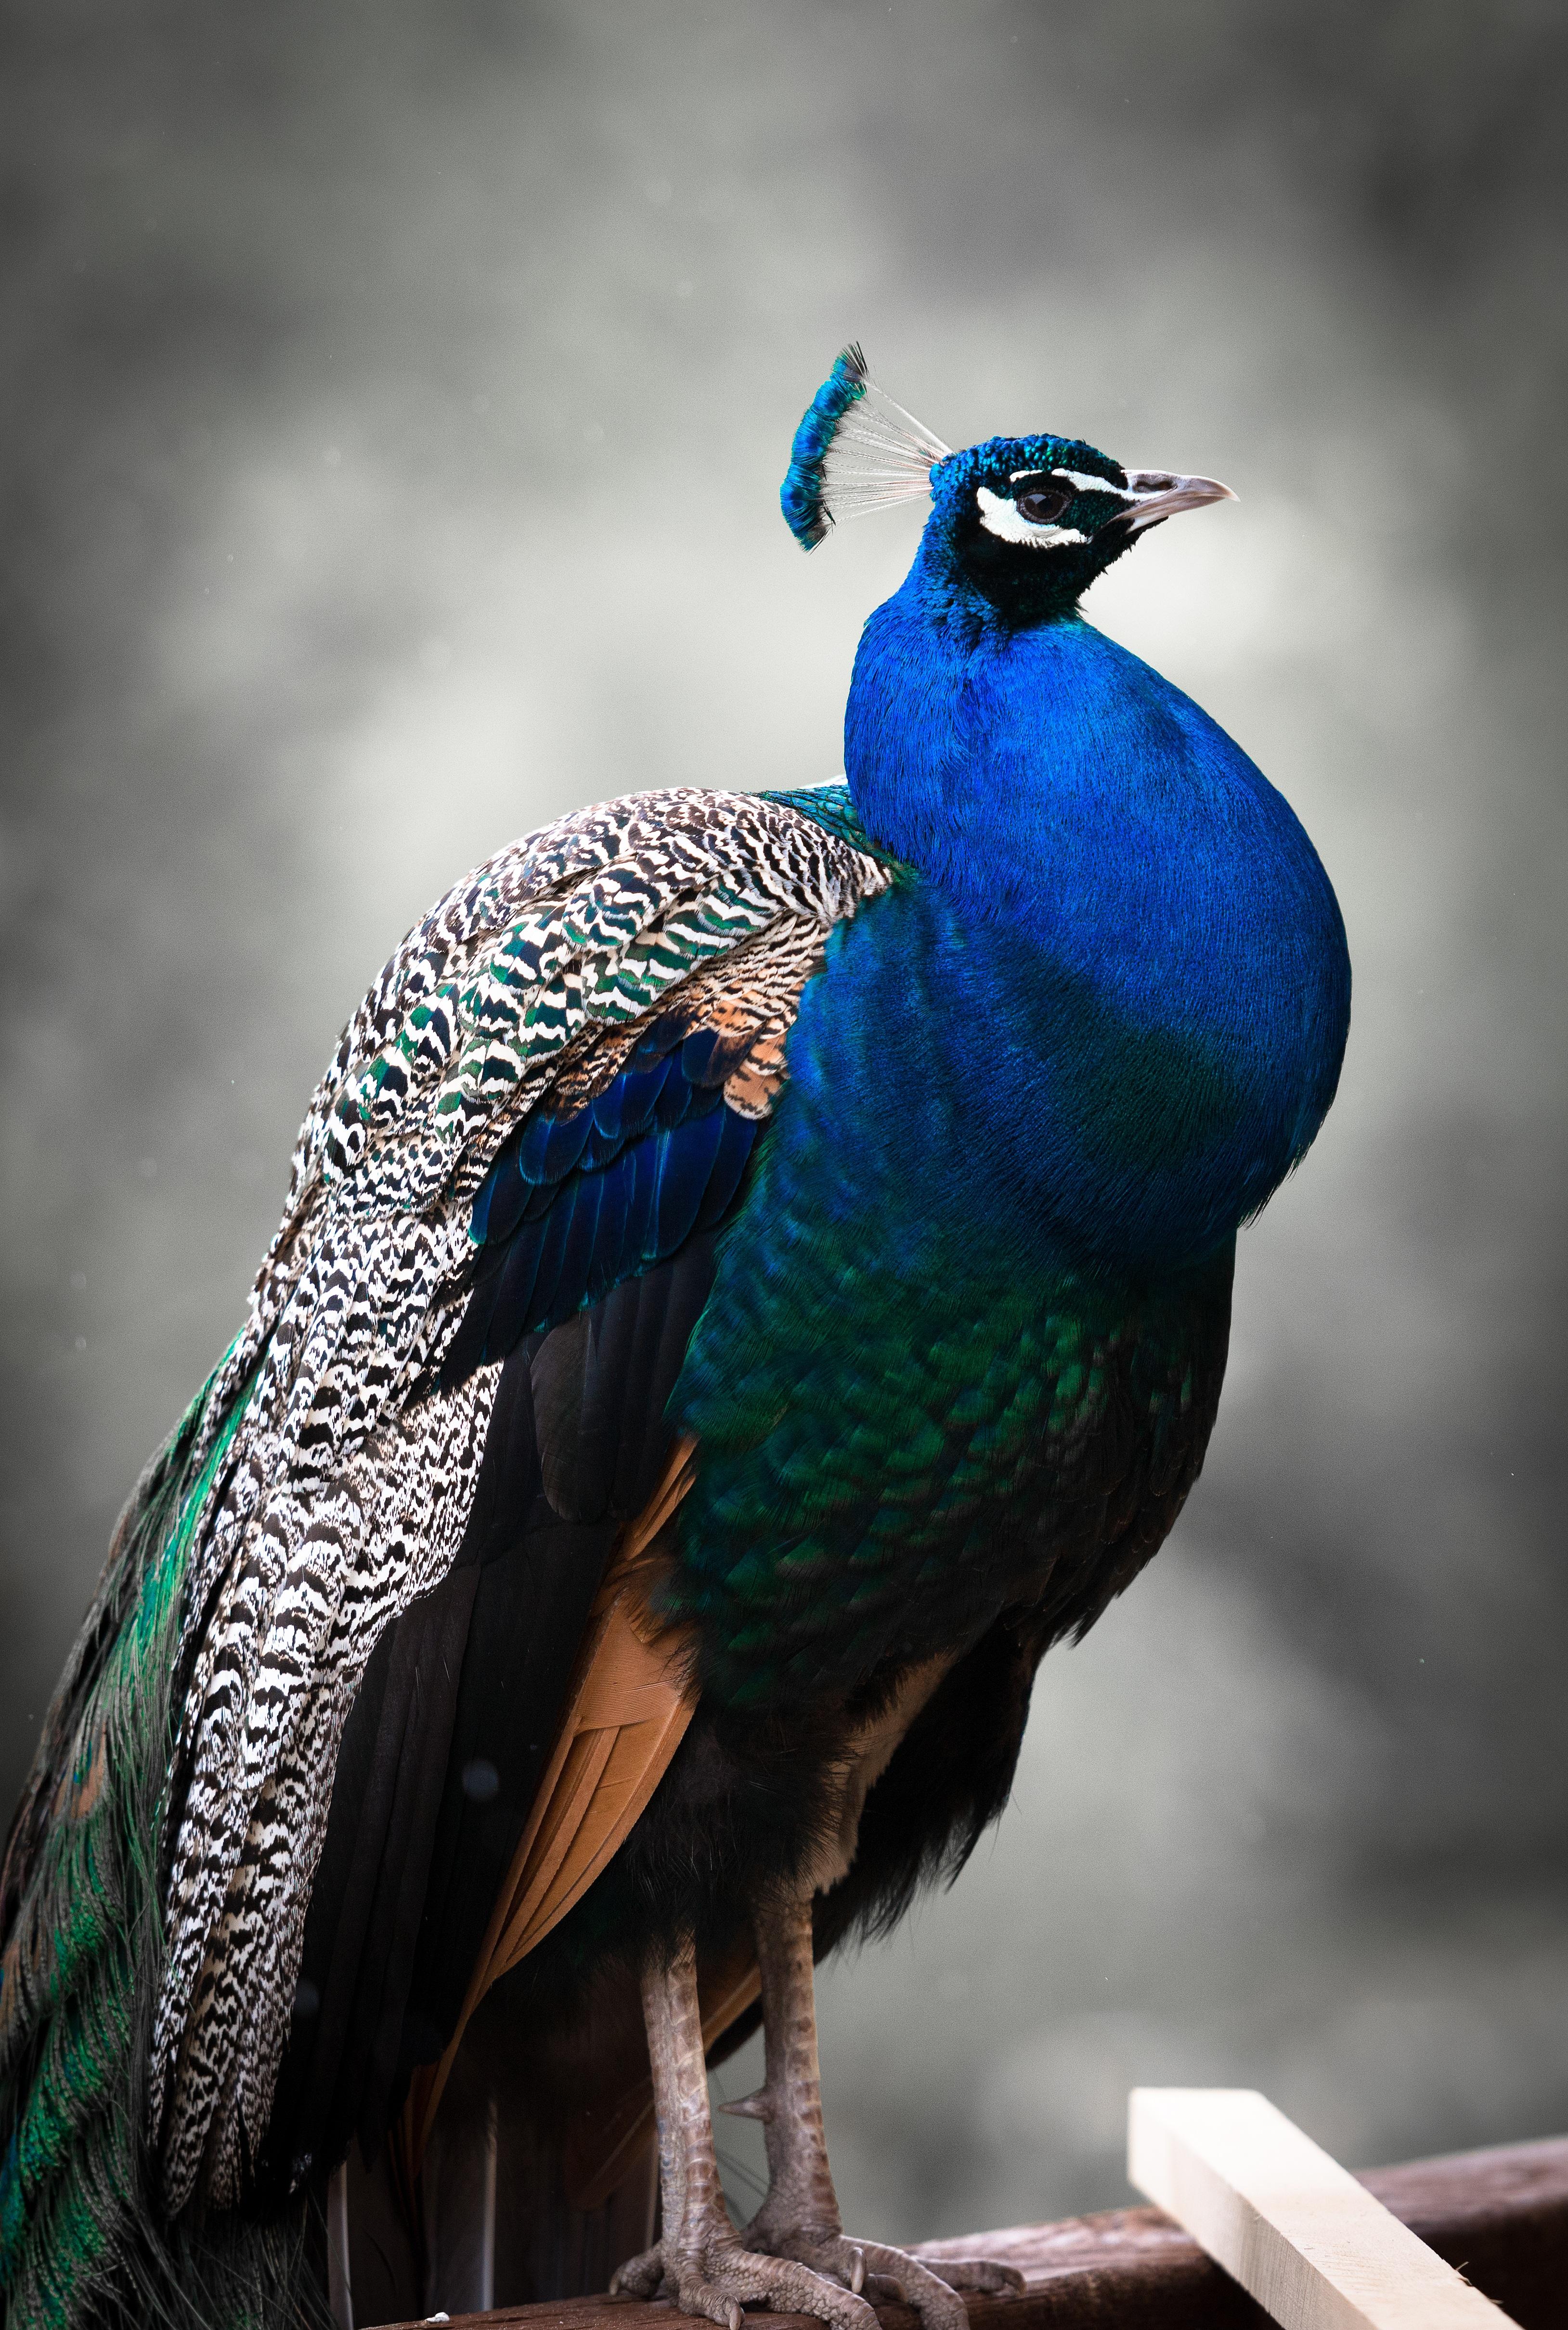 Free Images : nature, bird, wing, animal, wildlife, zoo ...